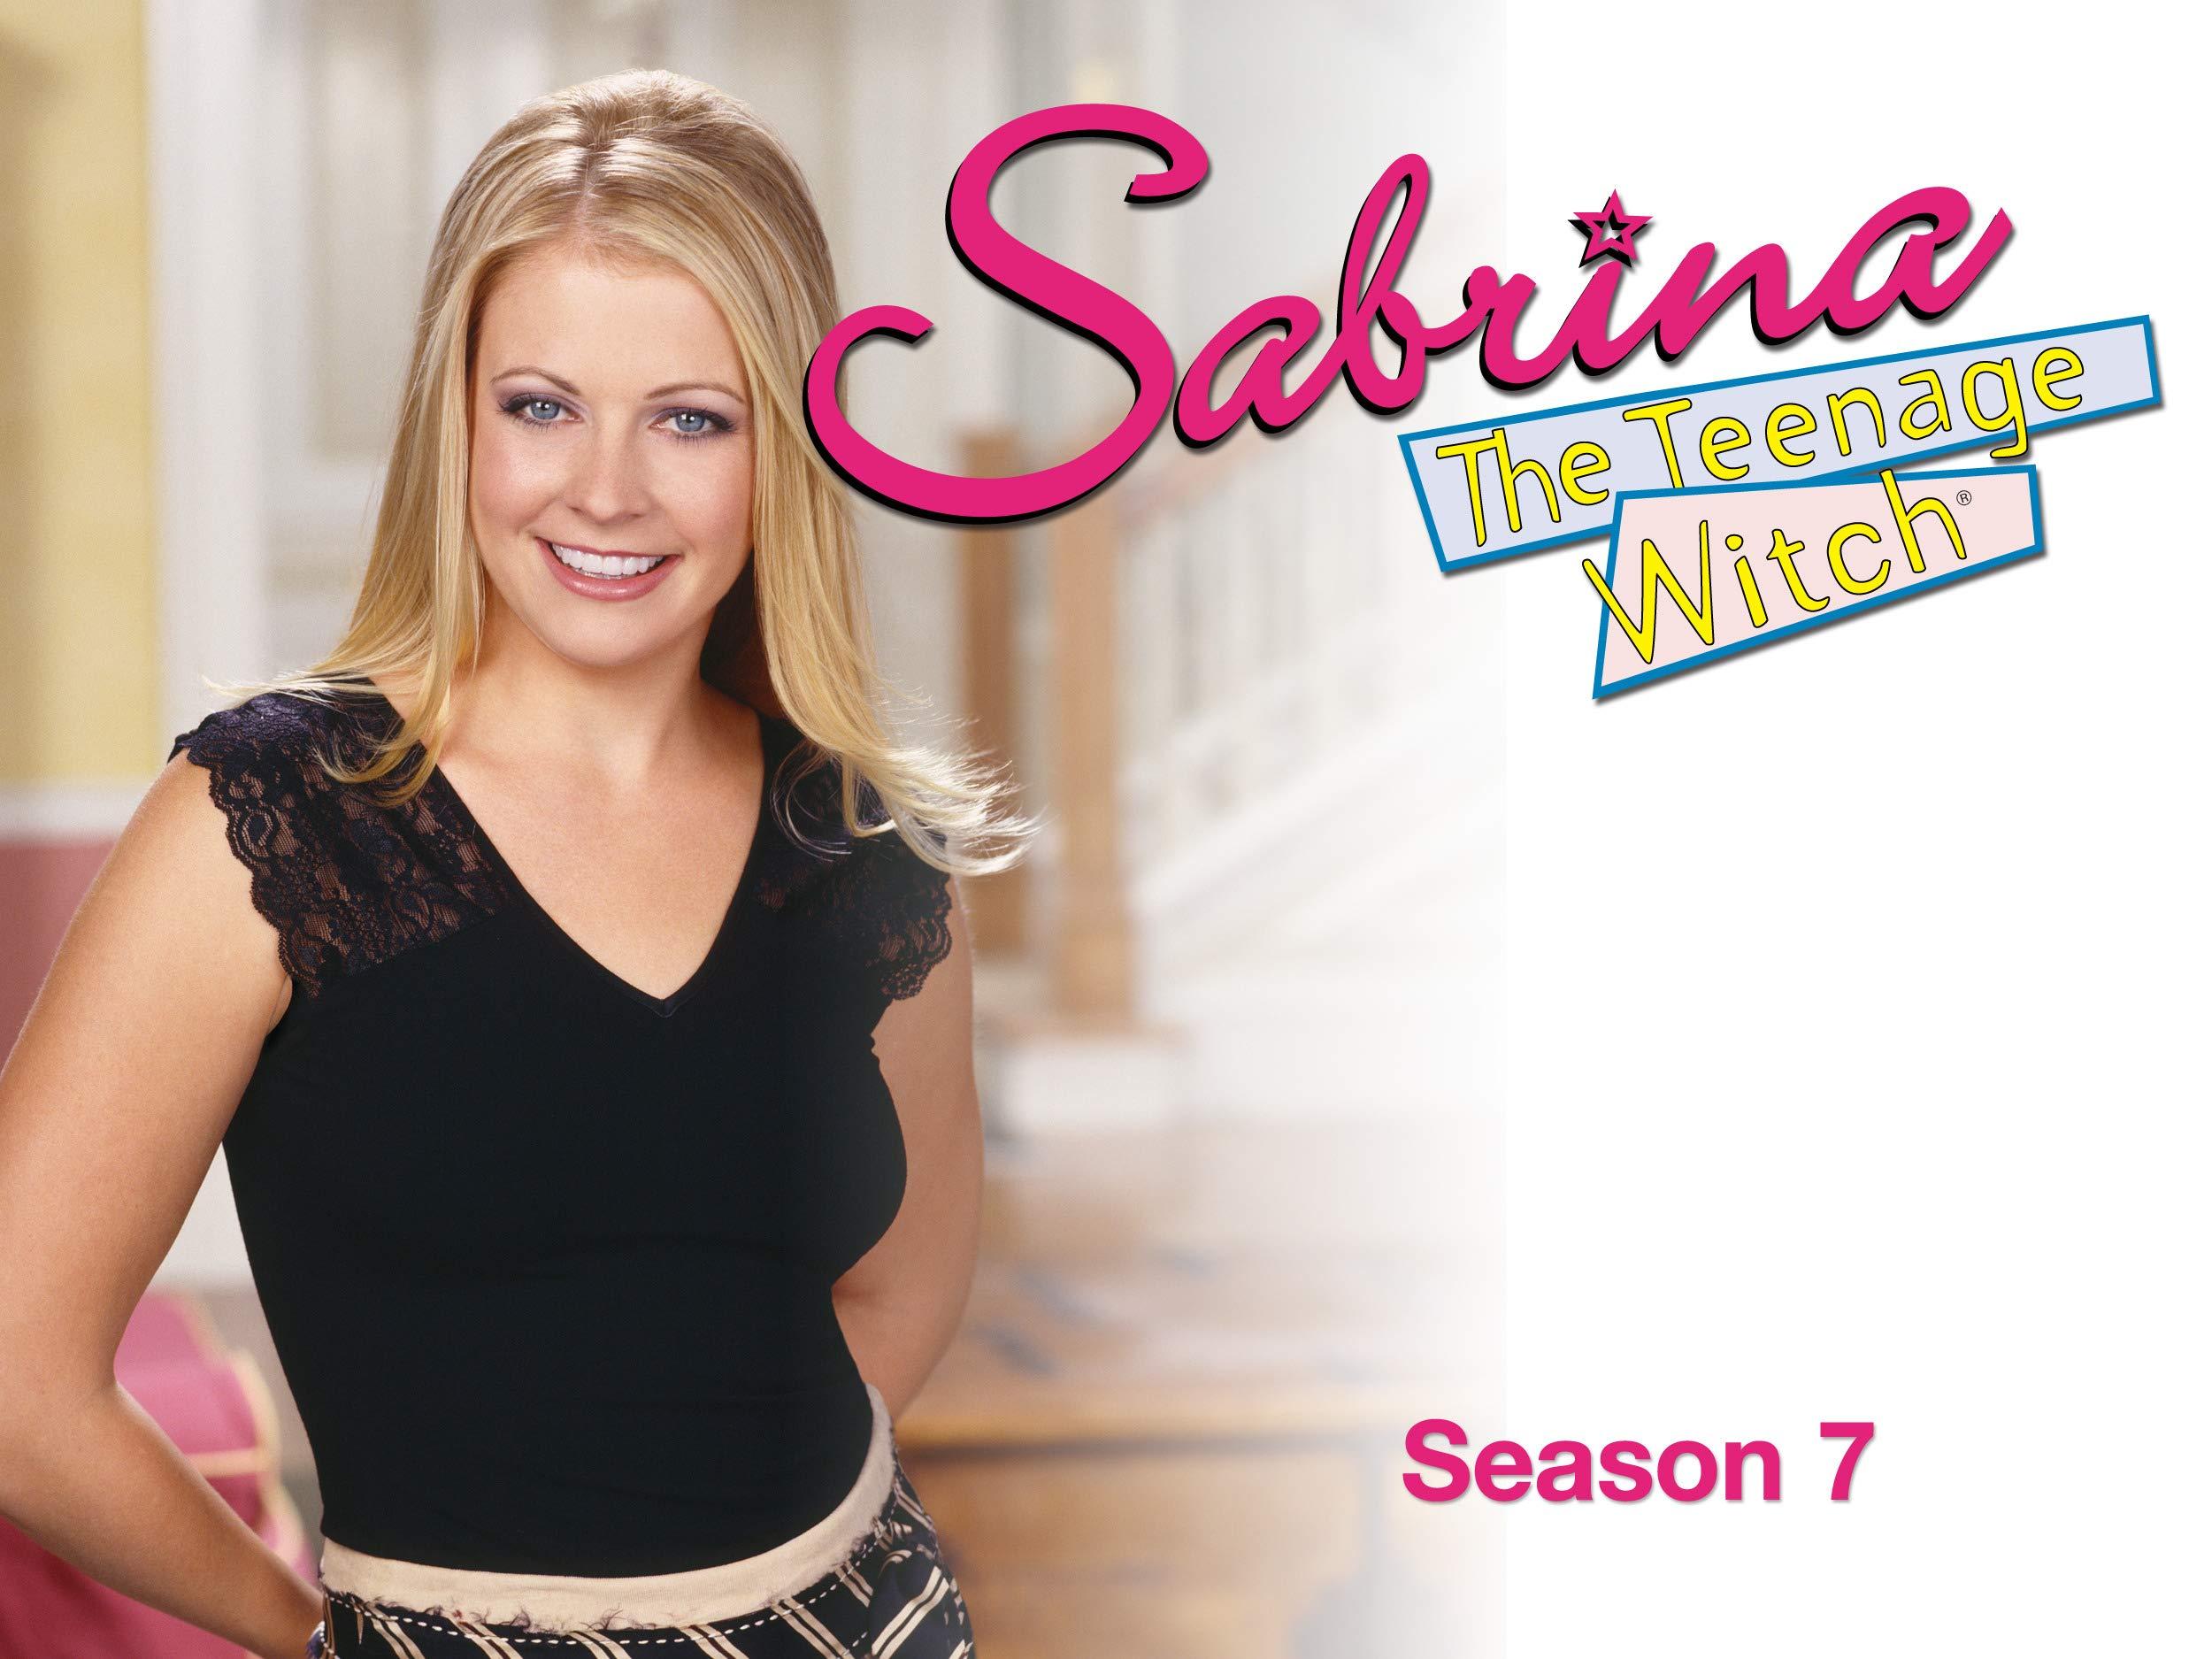 Sabrina: The Teenage Witch - Season 7